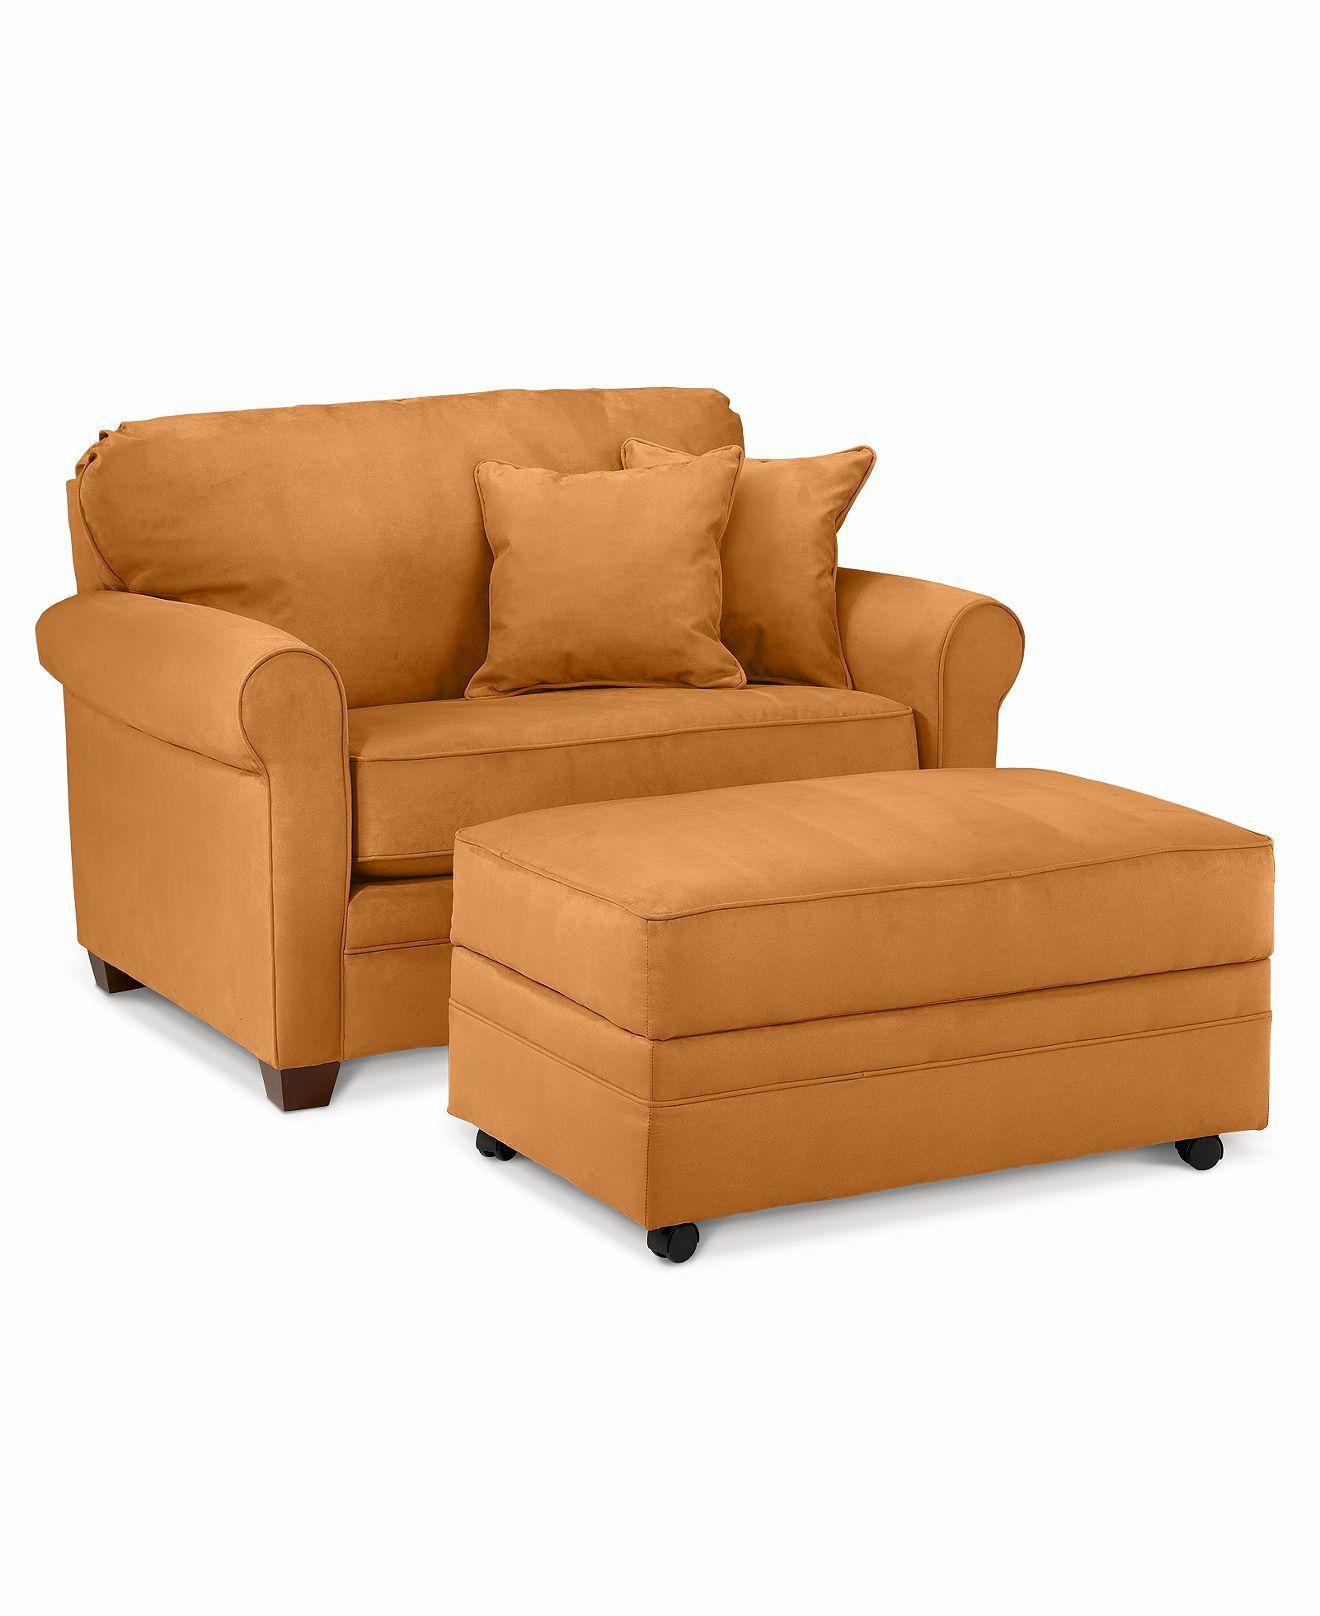 Cheap Sectional Sofas Sasha Living Room Furniture Piece Sofa Bed Set Twin Sleeper and Ottoman